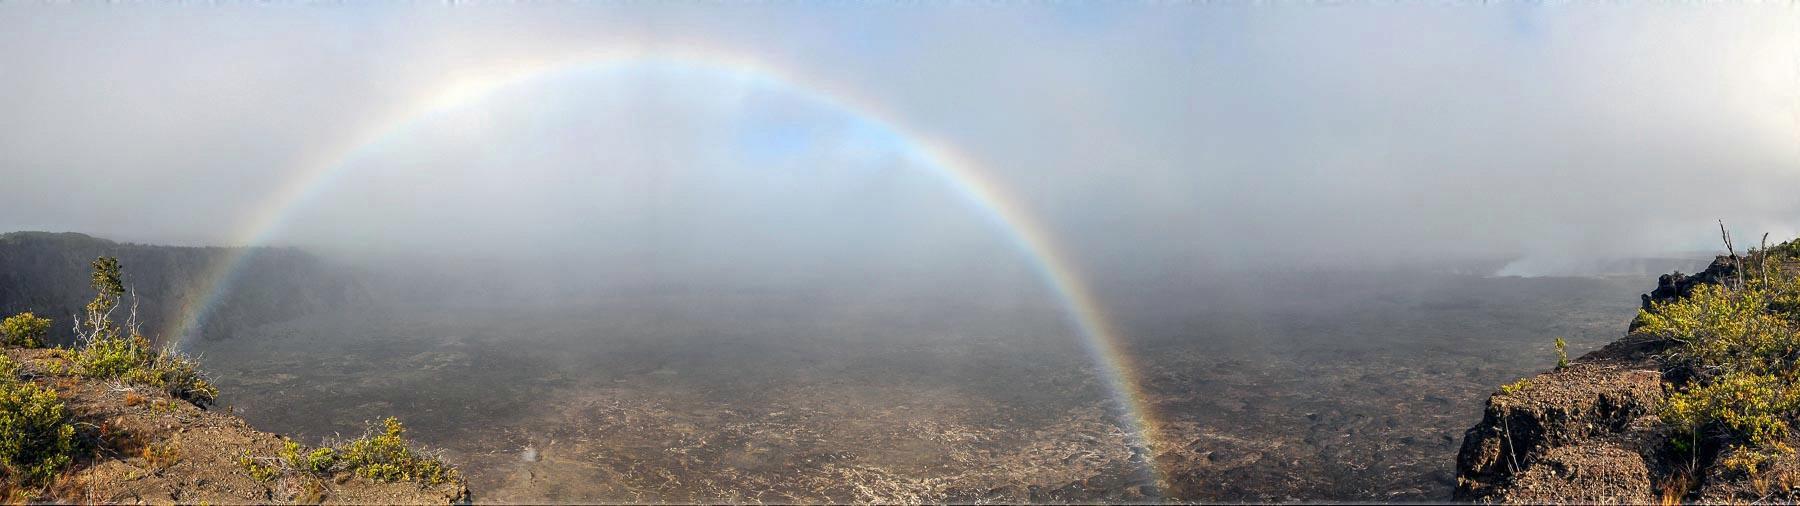 complete rainbow Kilauea Halema'uma'u Crater Hawaii